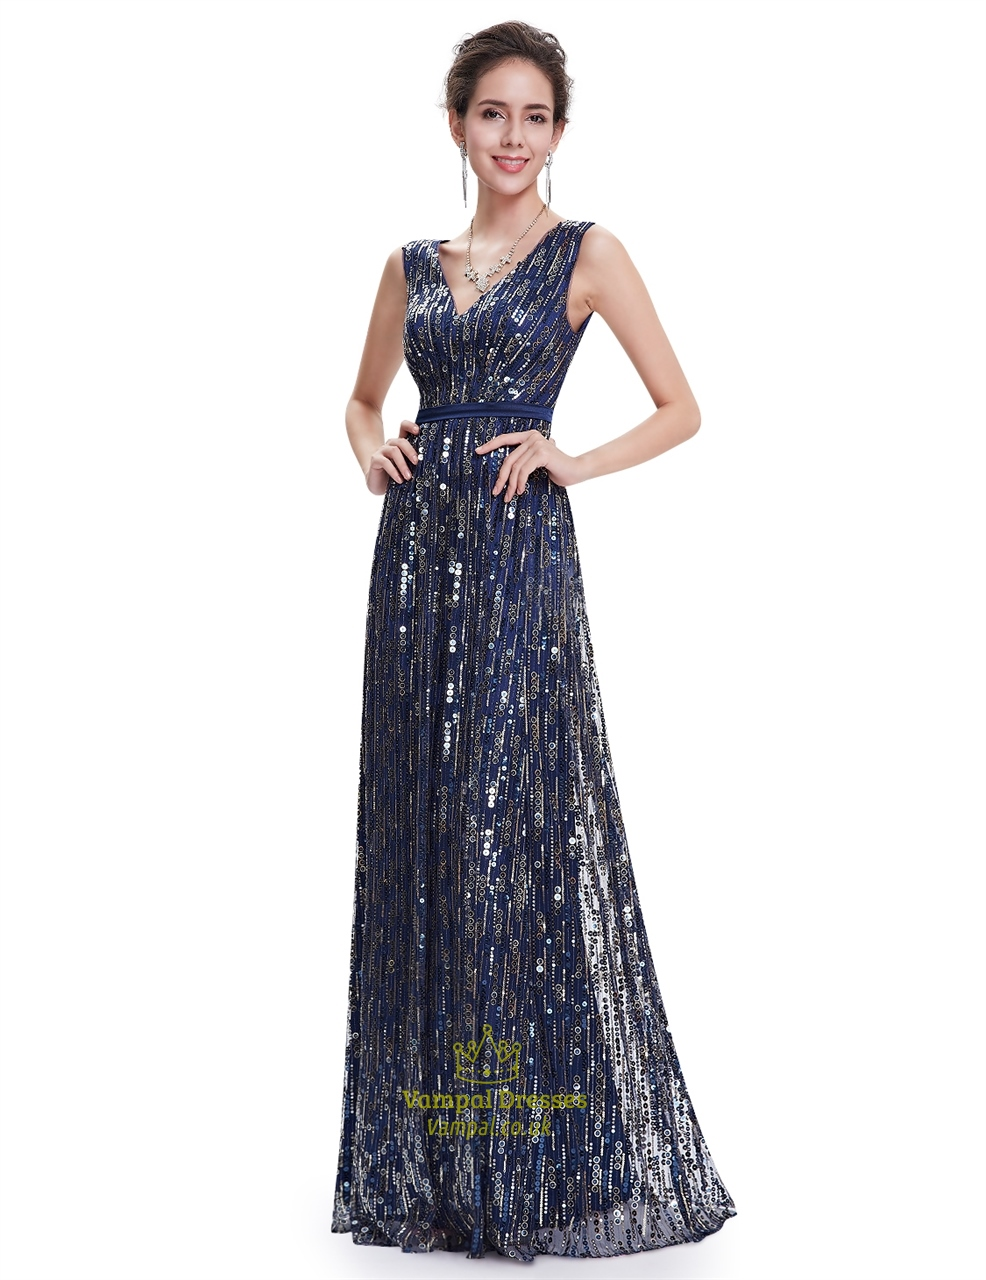 Elegant Navy Blue Floor Length Contrast V-Neck Sequin Prom ...